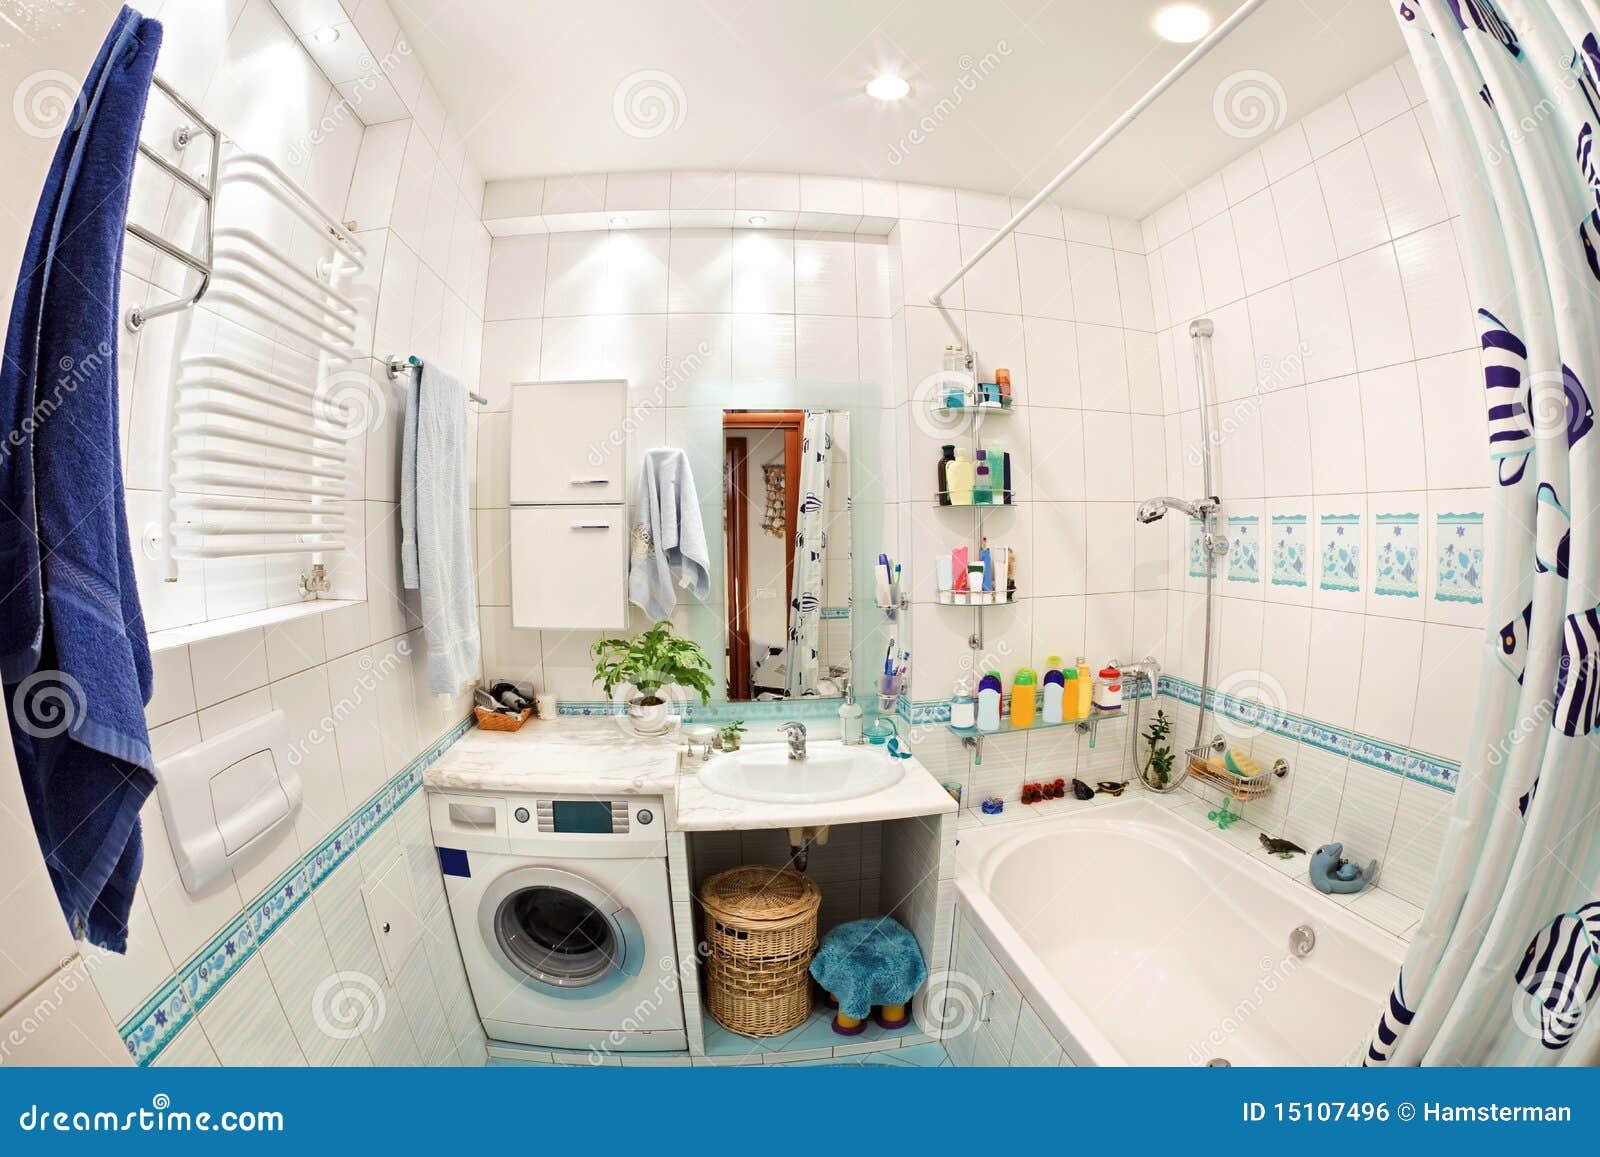 Goedkoop Badkamer Kast ~ Moderne kleine badkamers in de blauwe mening van de kleuren brede hoek